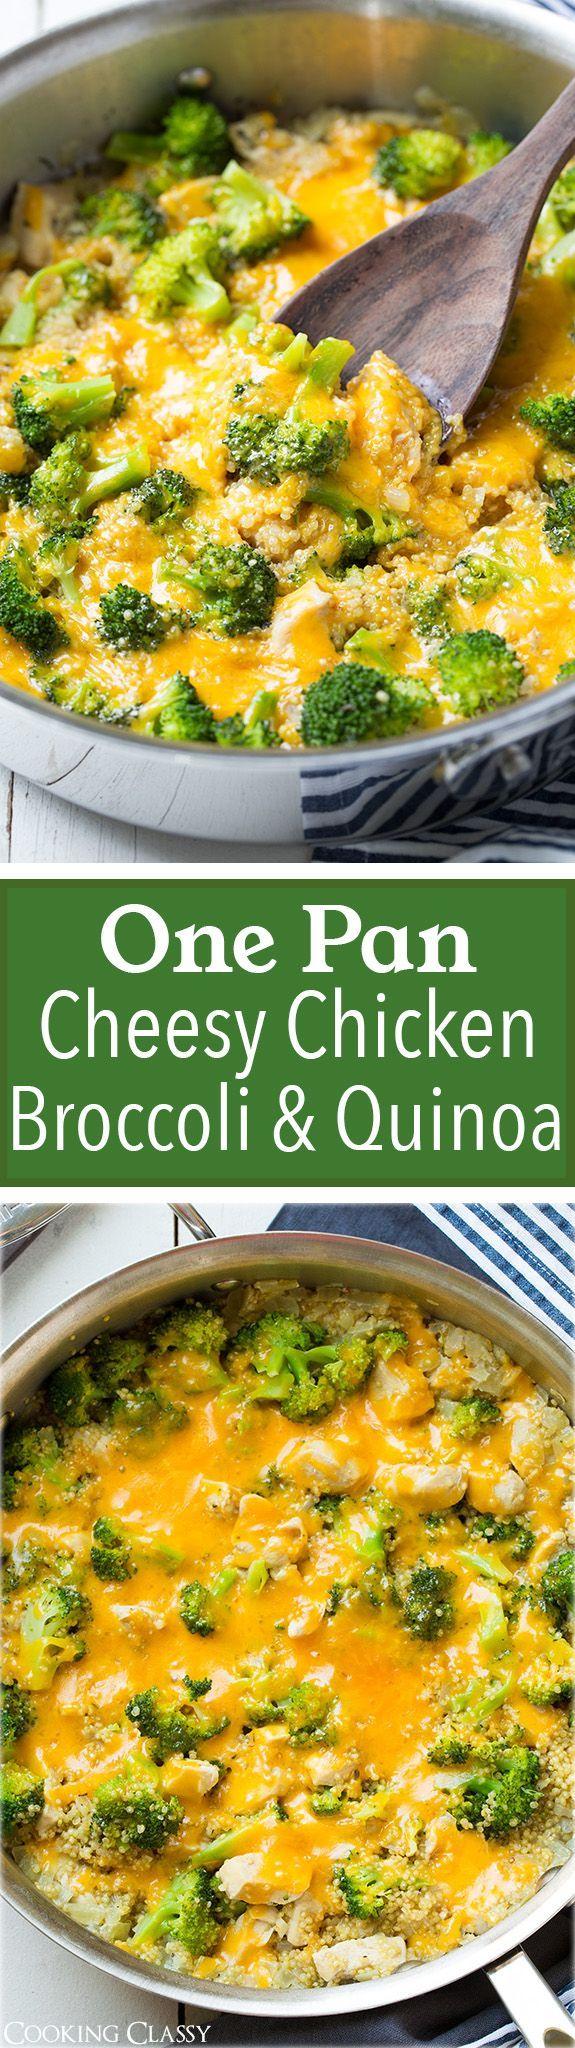 One-pan cheesy chicken broccoli and quinoa recipe! It's easy, healthy and delicious!